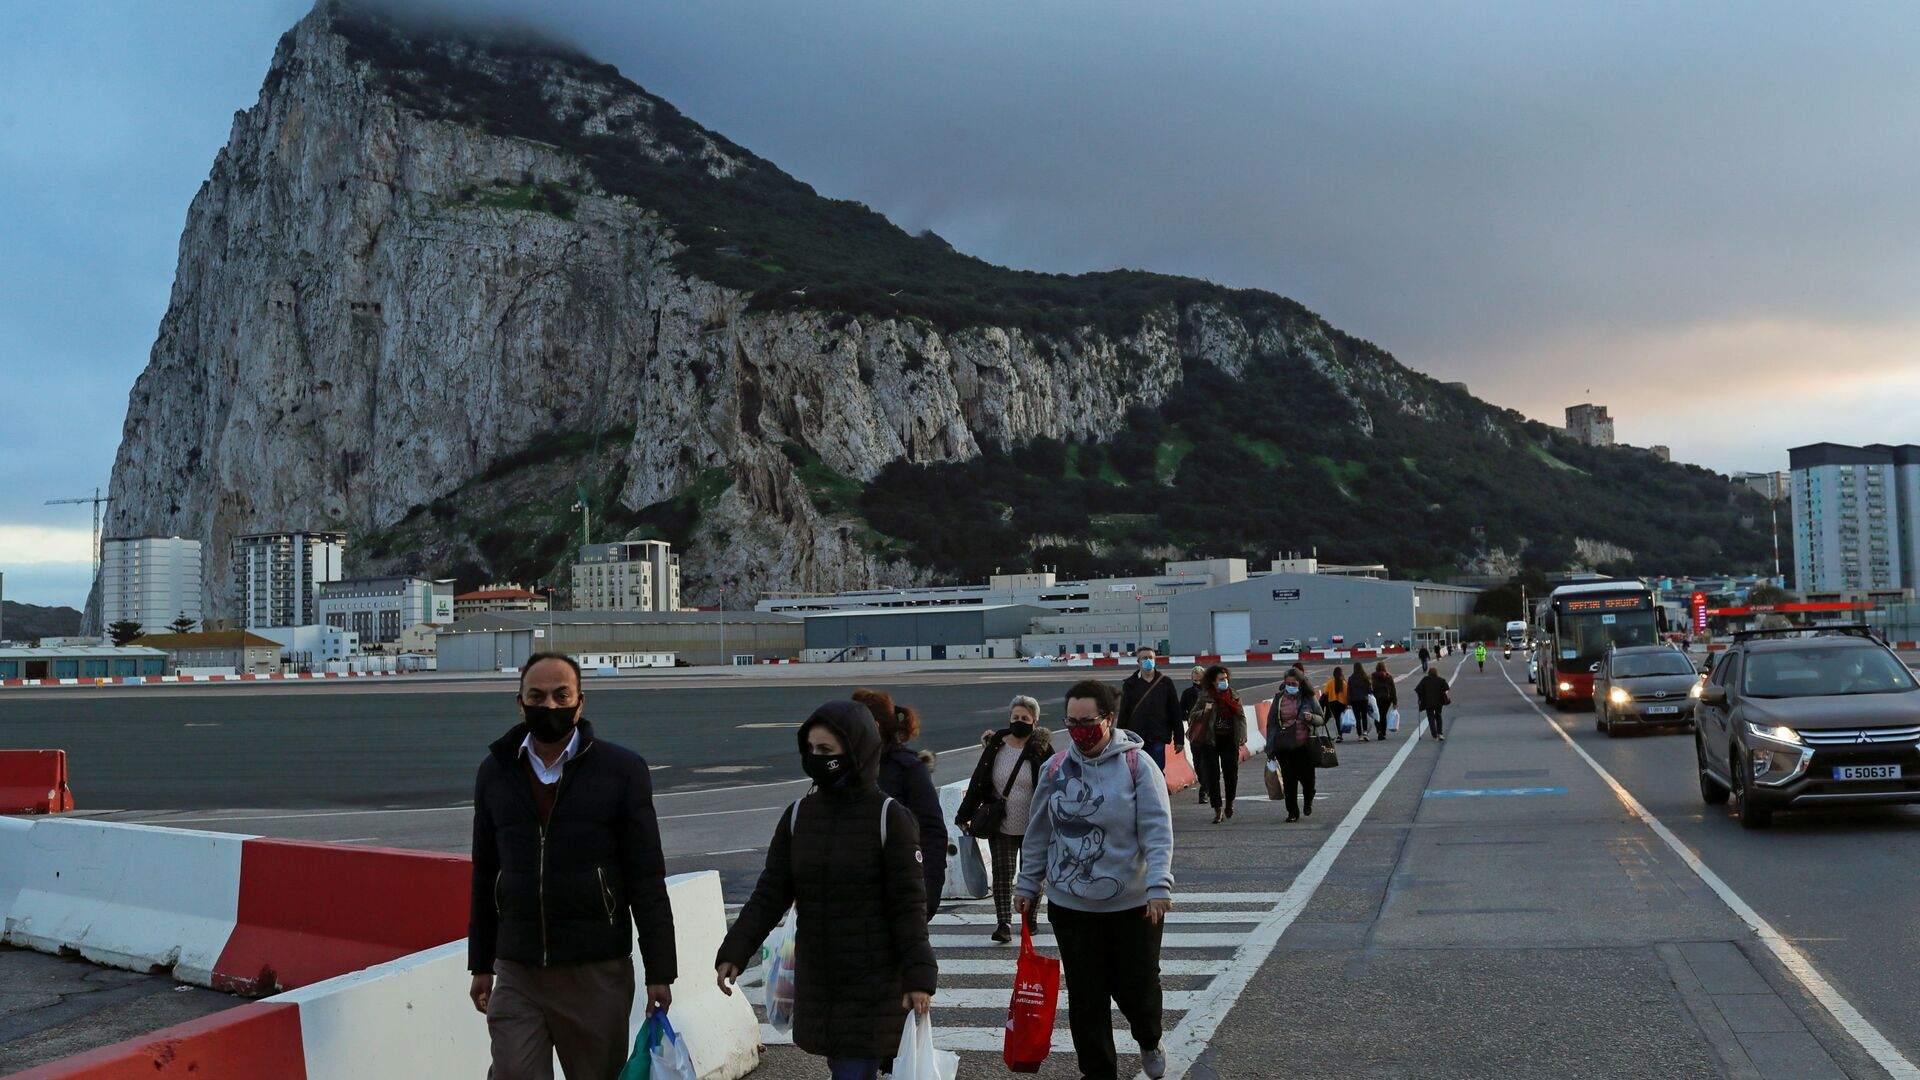 La gente en mascarillas en Gibraltar - Sputnik Mundo, 1920, 25.06.2021